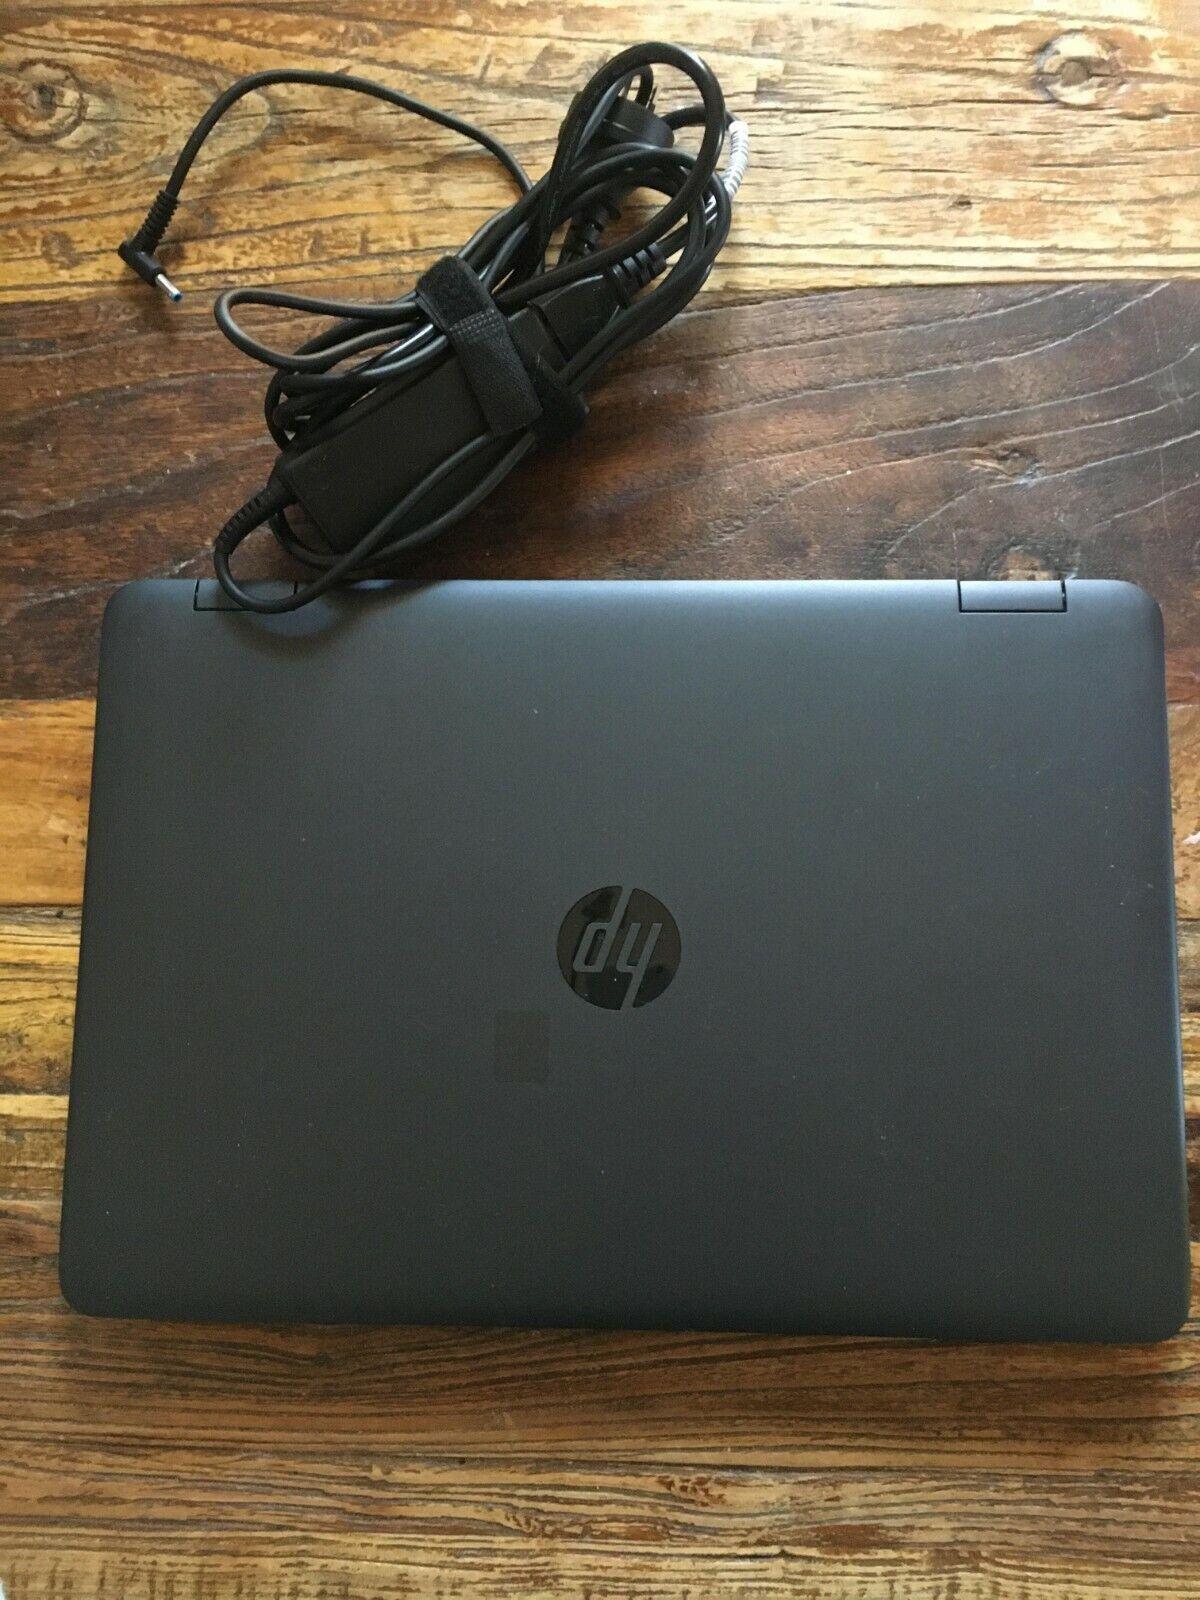 Laptop Windows - HP Pro Book 650G2 15.6'' i3 6100U 2.3GHz 4GB 128G SSD Window 10